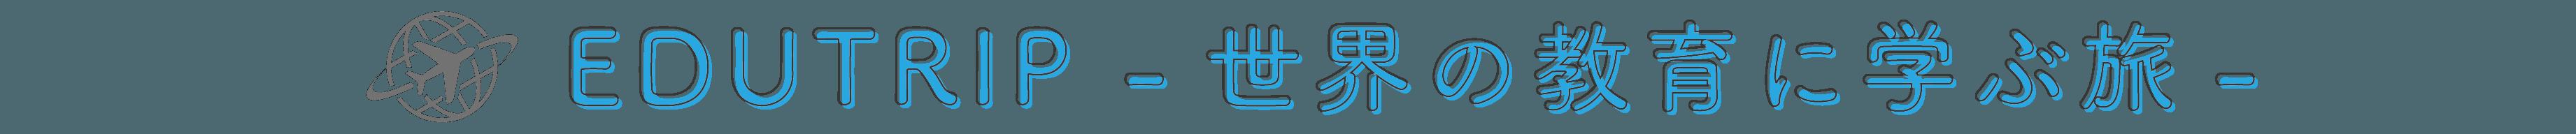 EDUTRIP - 世界の教育に学ぶ旅 -